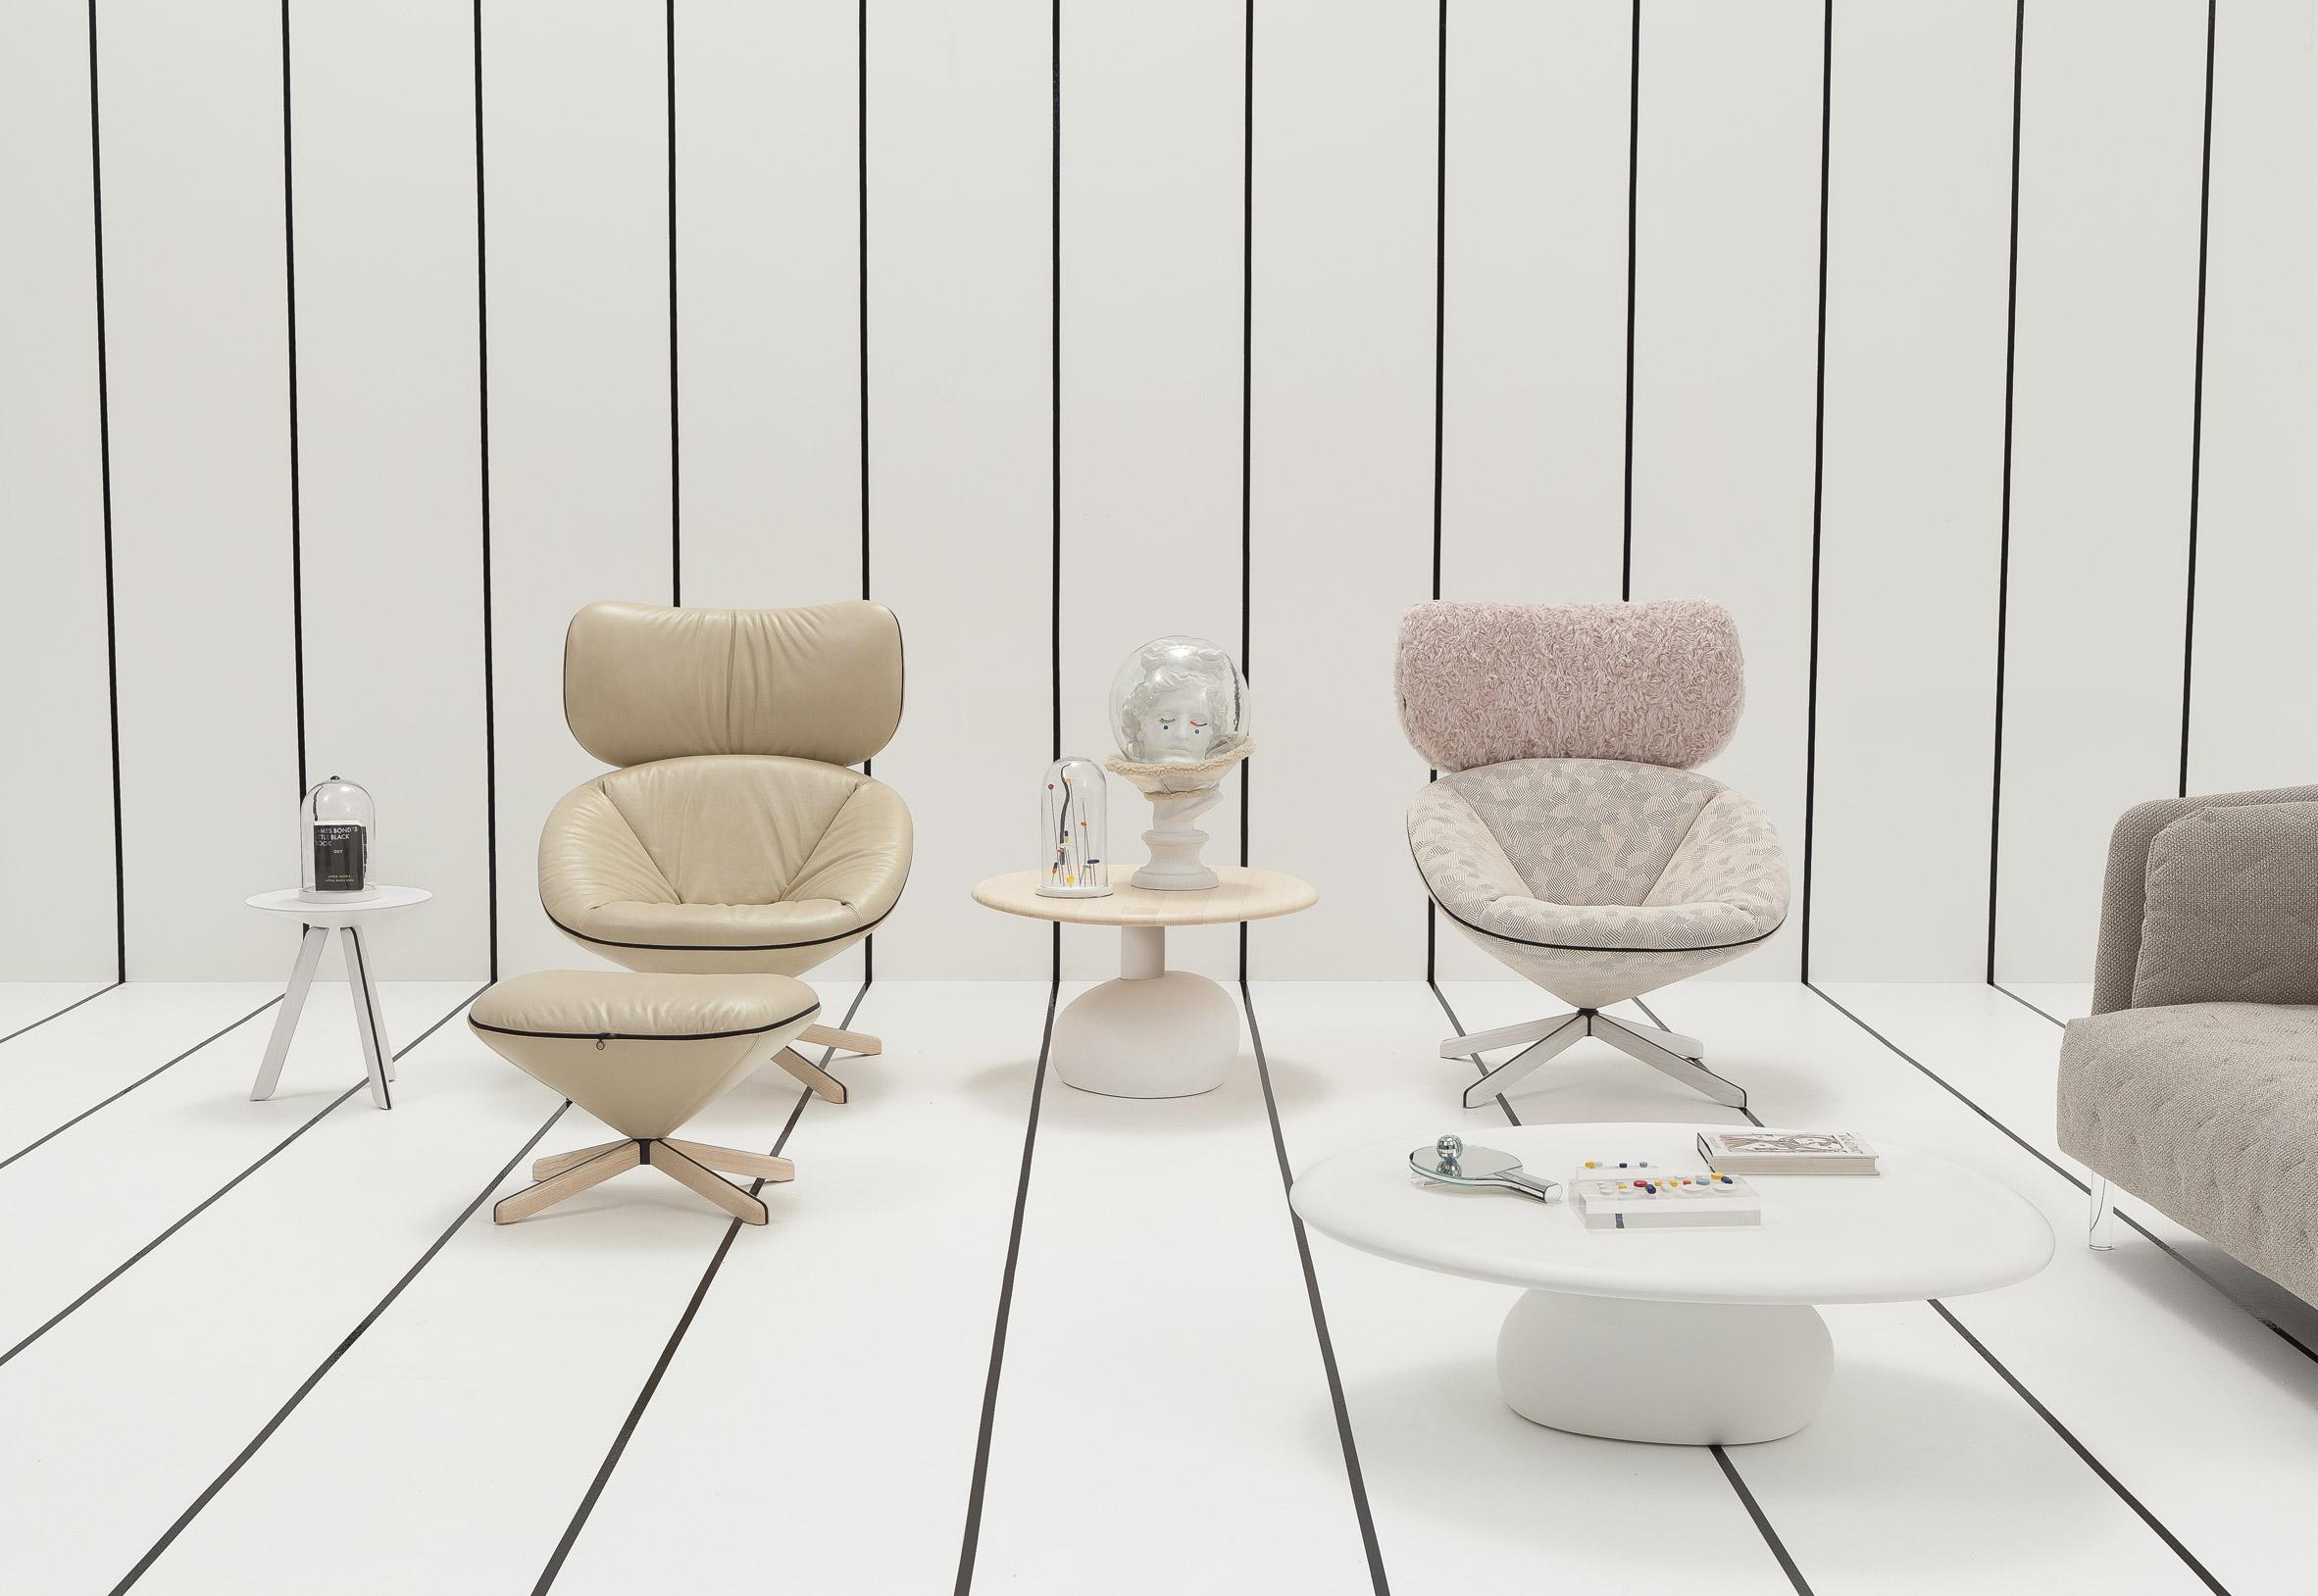 tortuga-chair-nadadora-sancal-tortoise-lounge-seat-extra_dezeen_2364_col_7-1